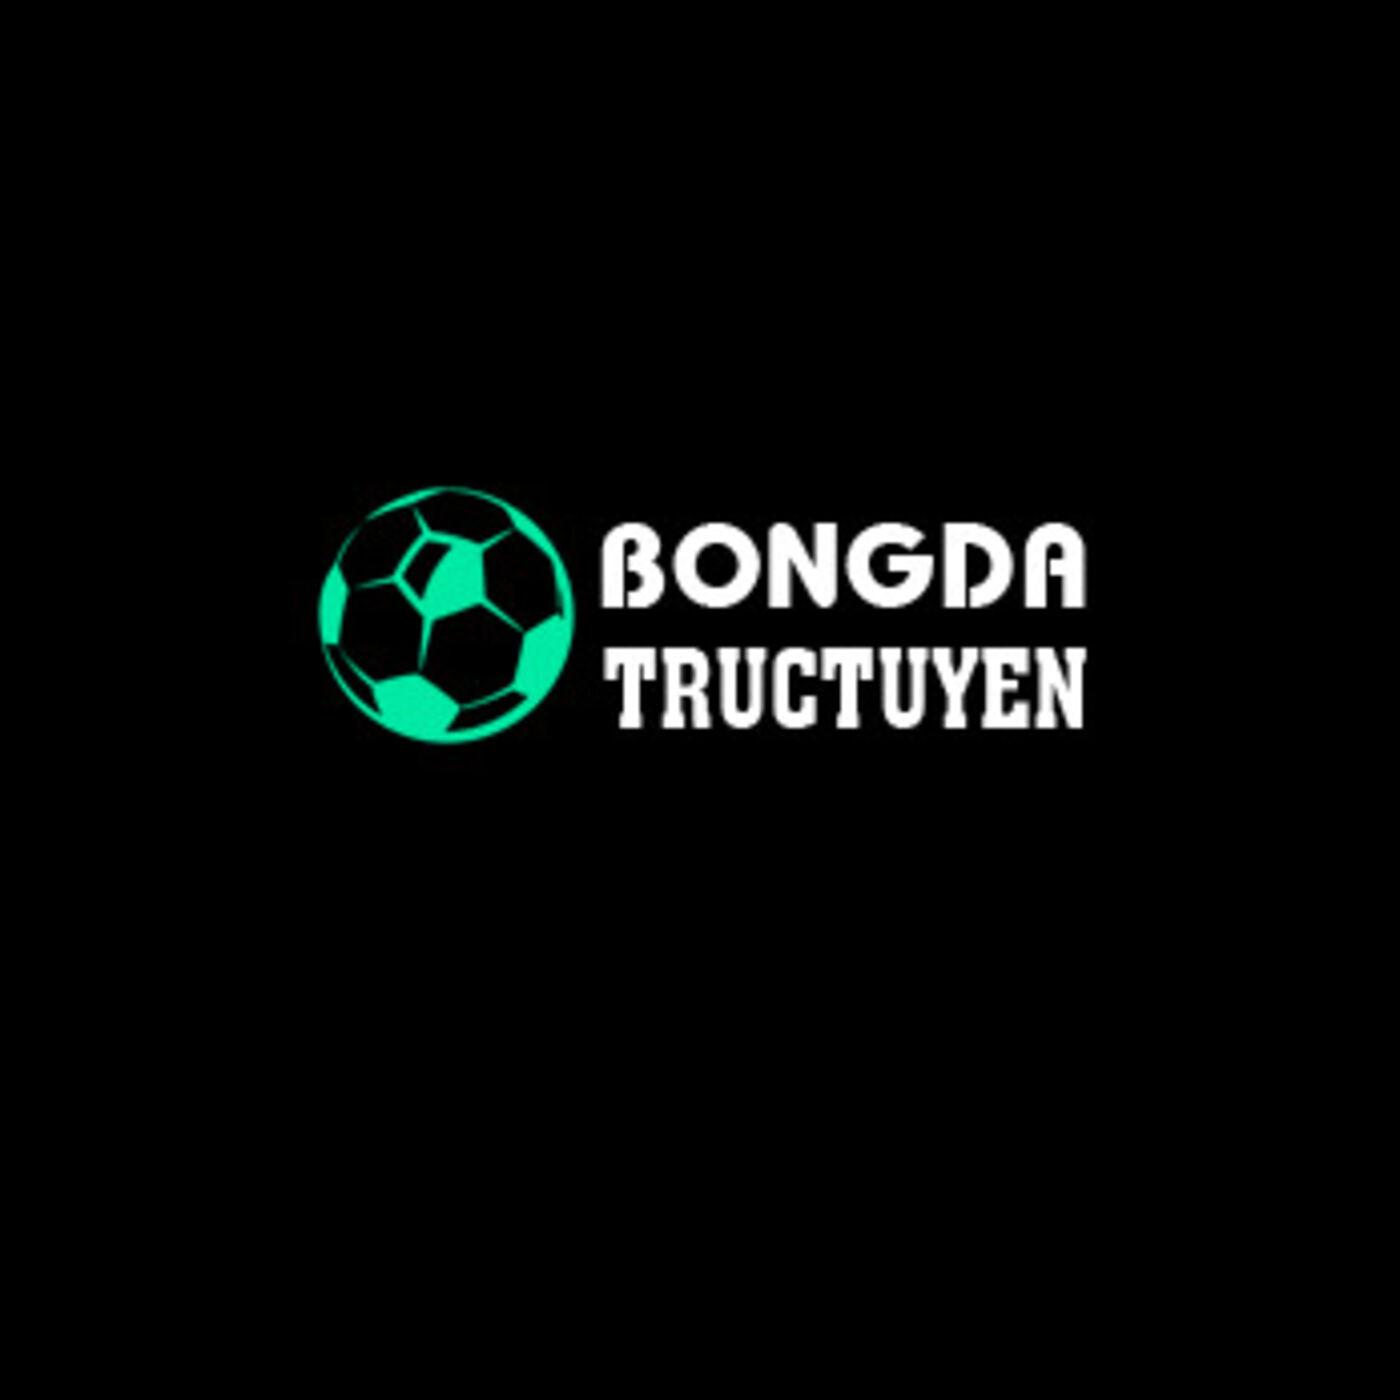 Truc tiep bong da tren K+1 https://bongdatructuyen.co